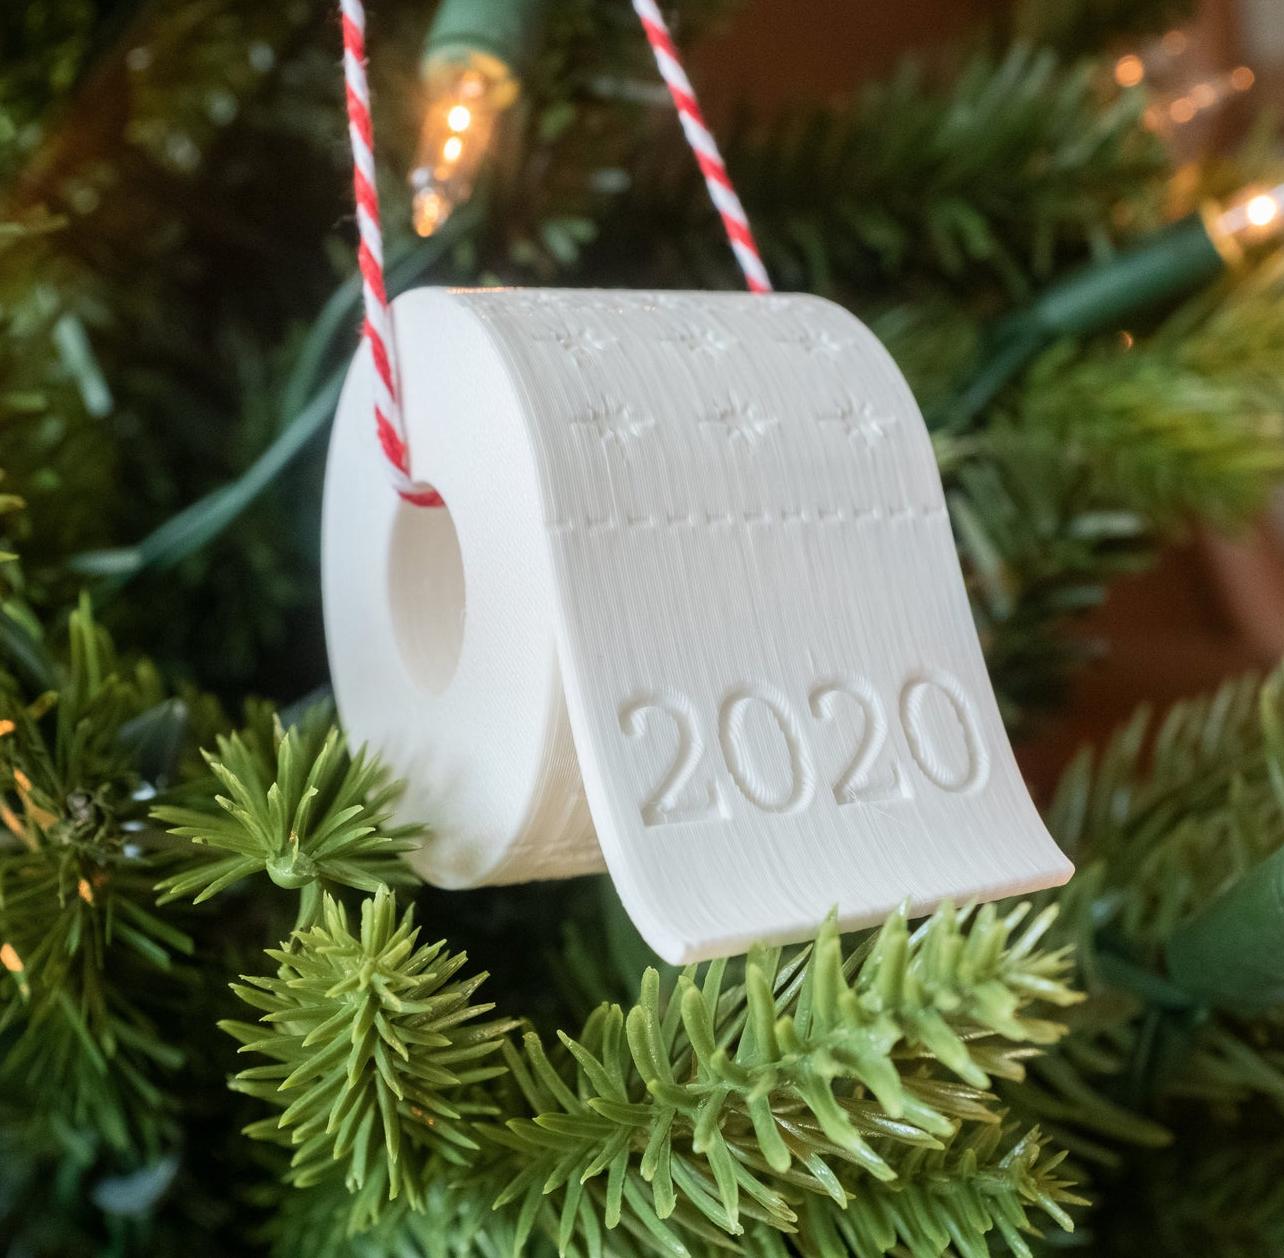 Pandemic Ornament 2020 Christmas Ornament souvenir COVID Christmas